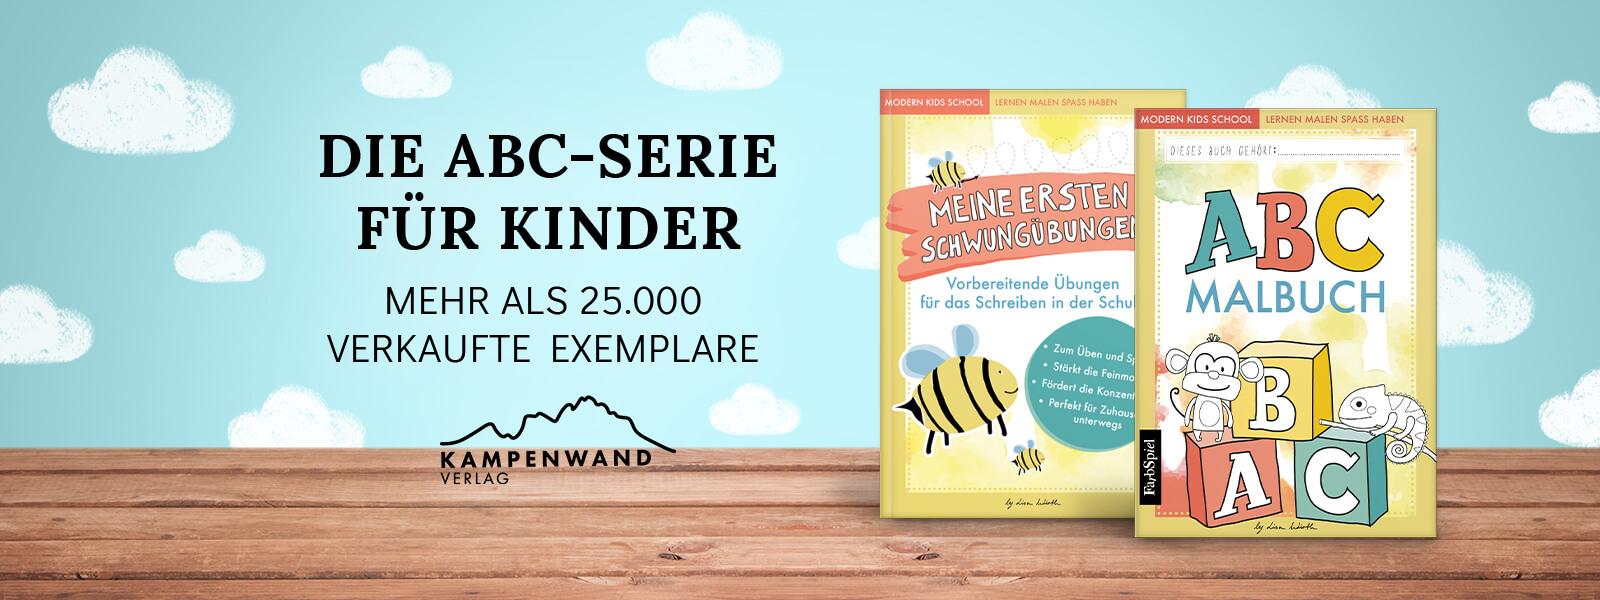 Bestseller! ABC-Lernreihe für Kinder